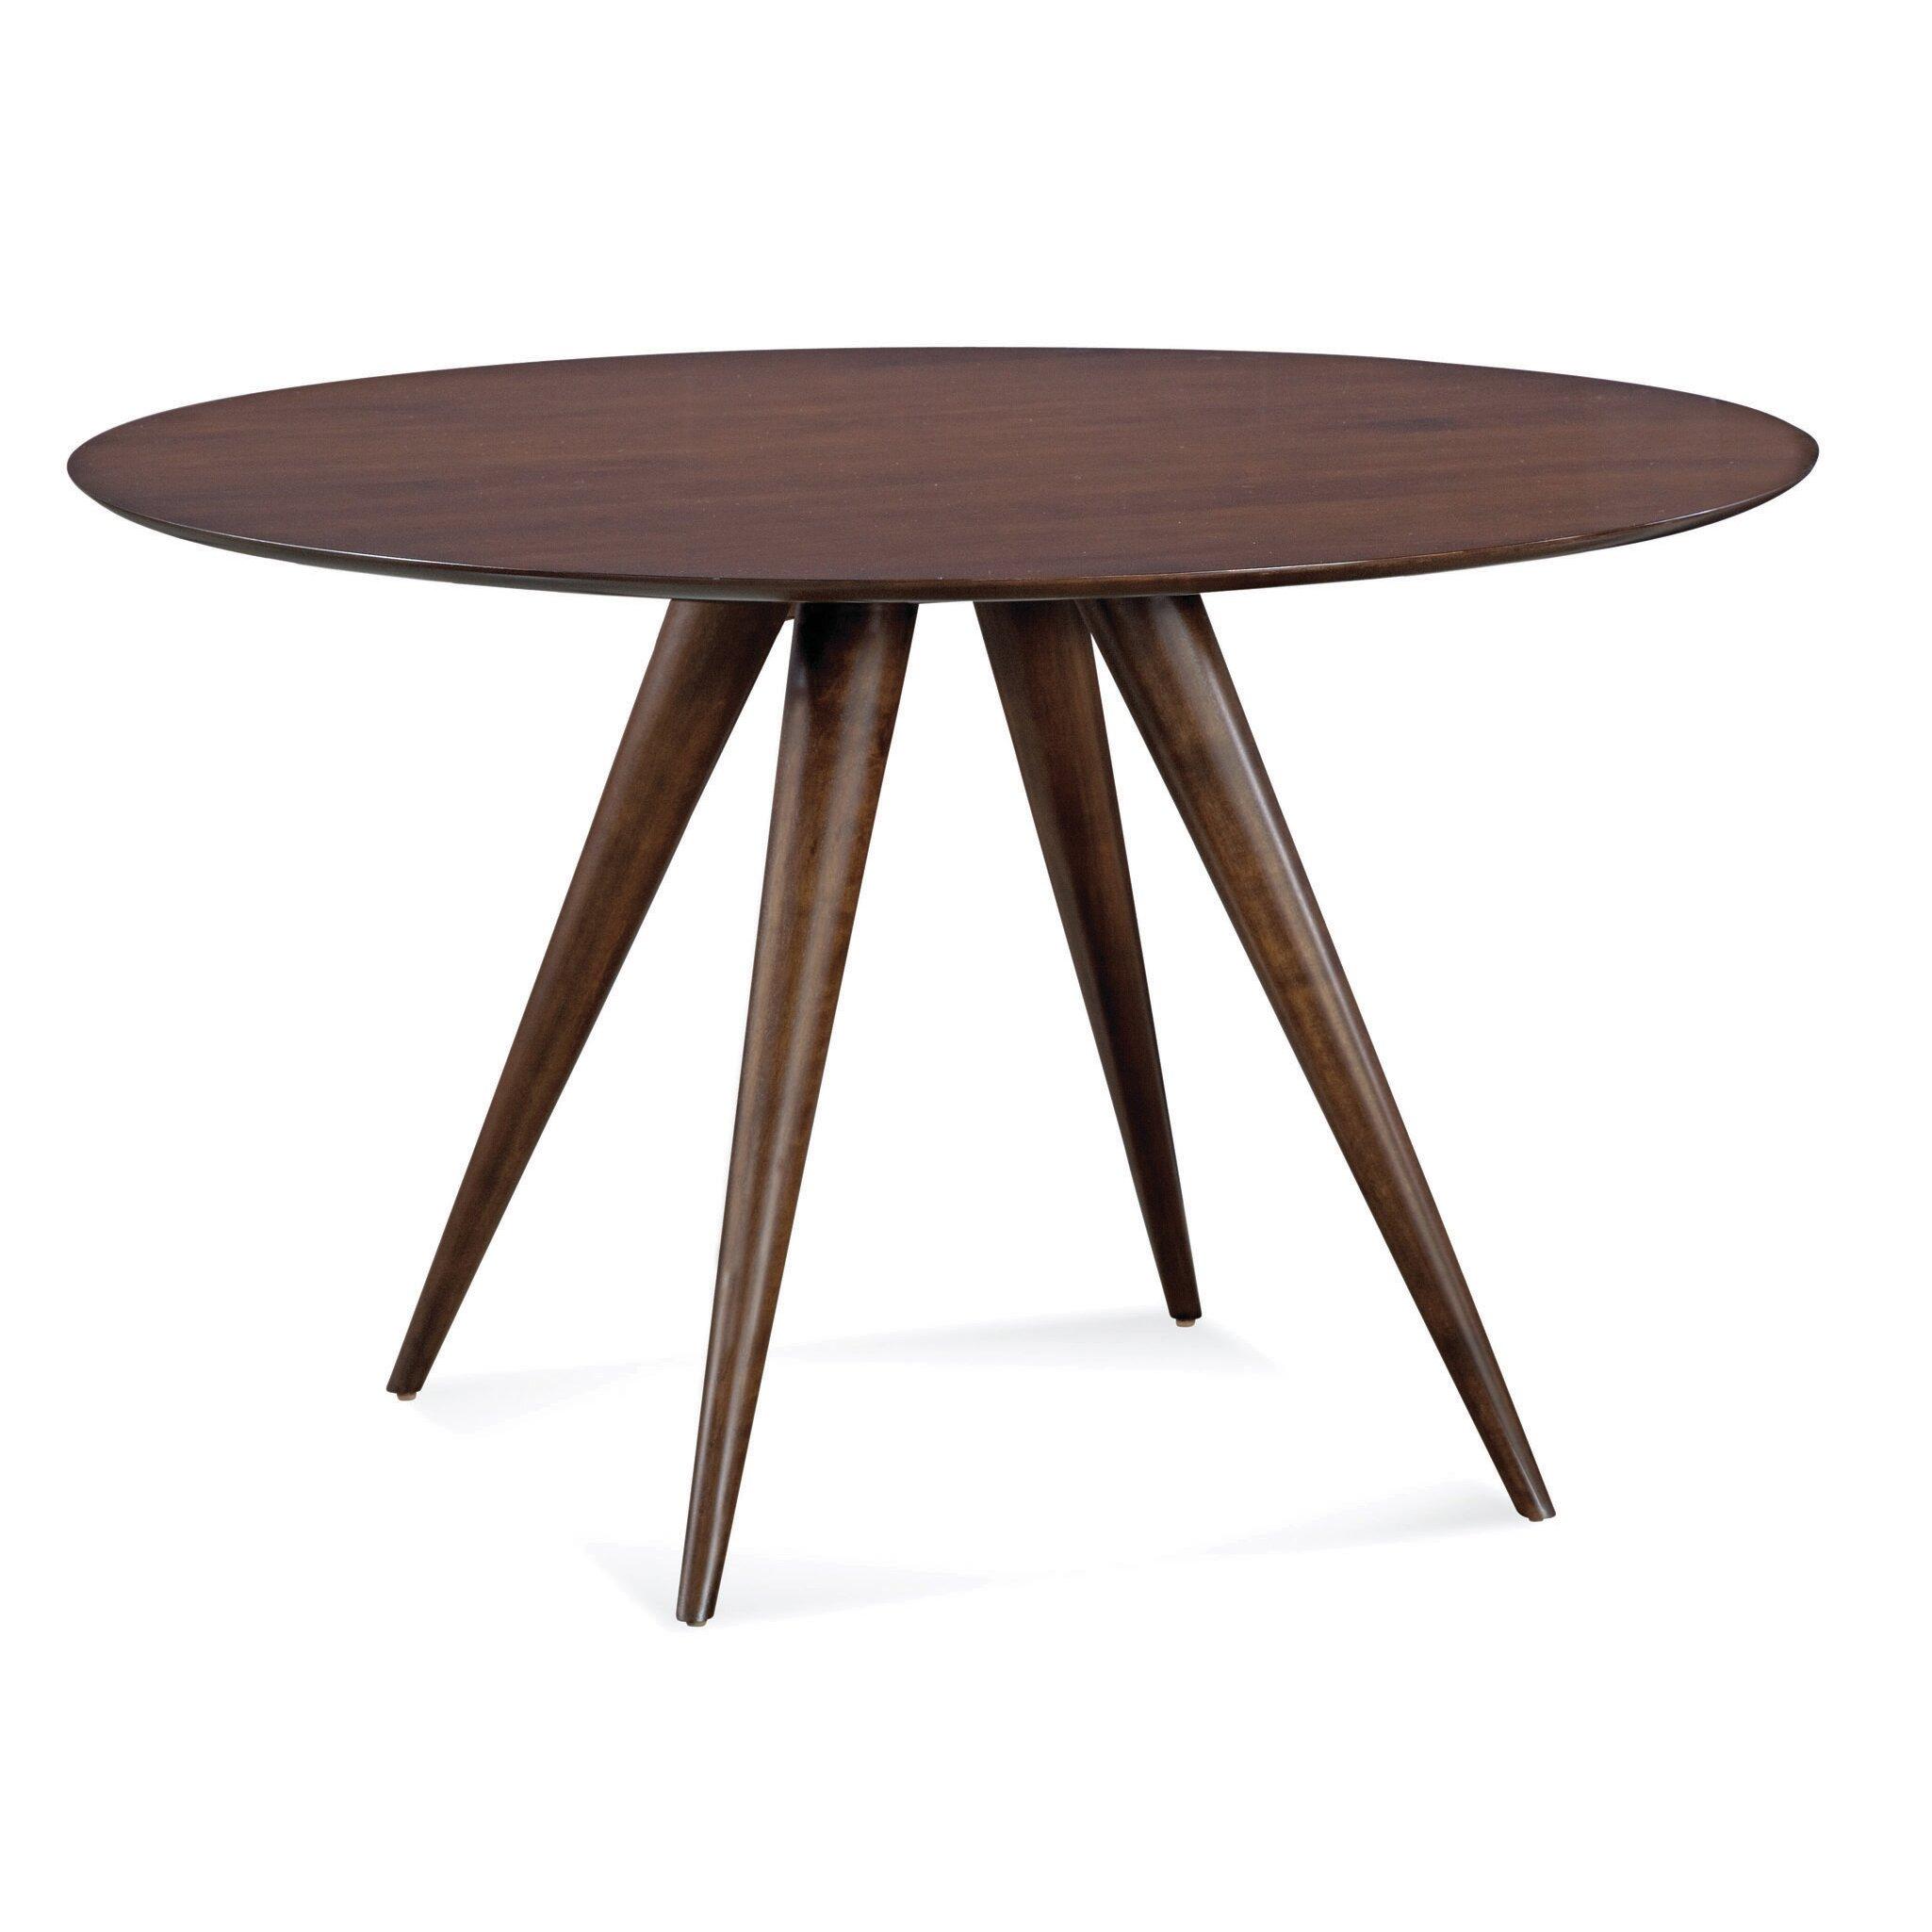 Saloom furniture iris 80 dining table wayfair for 80s furniture